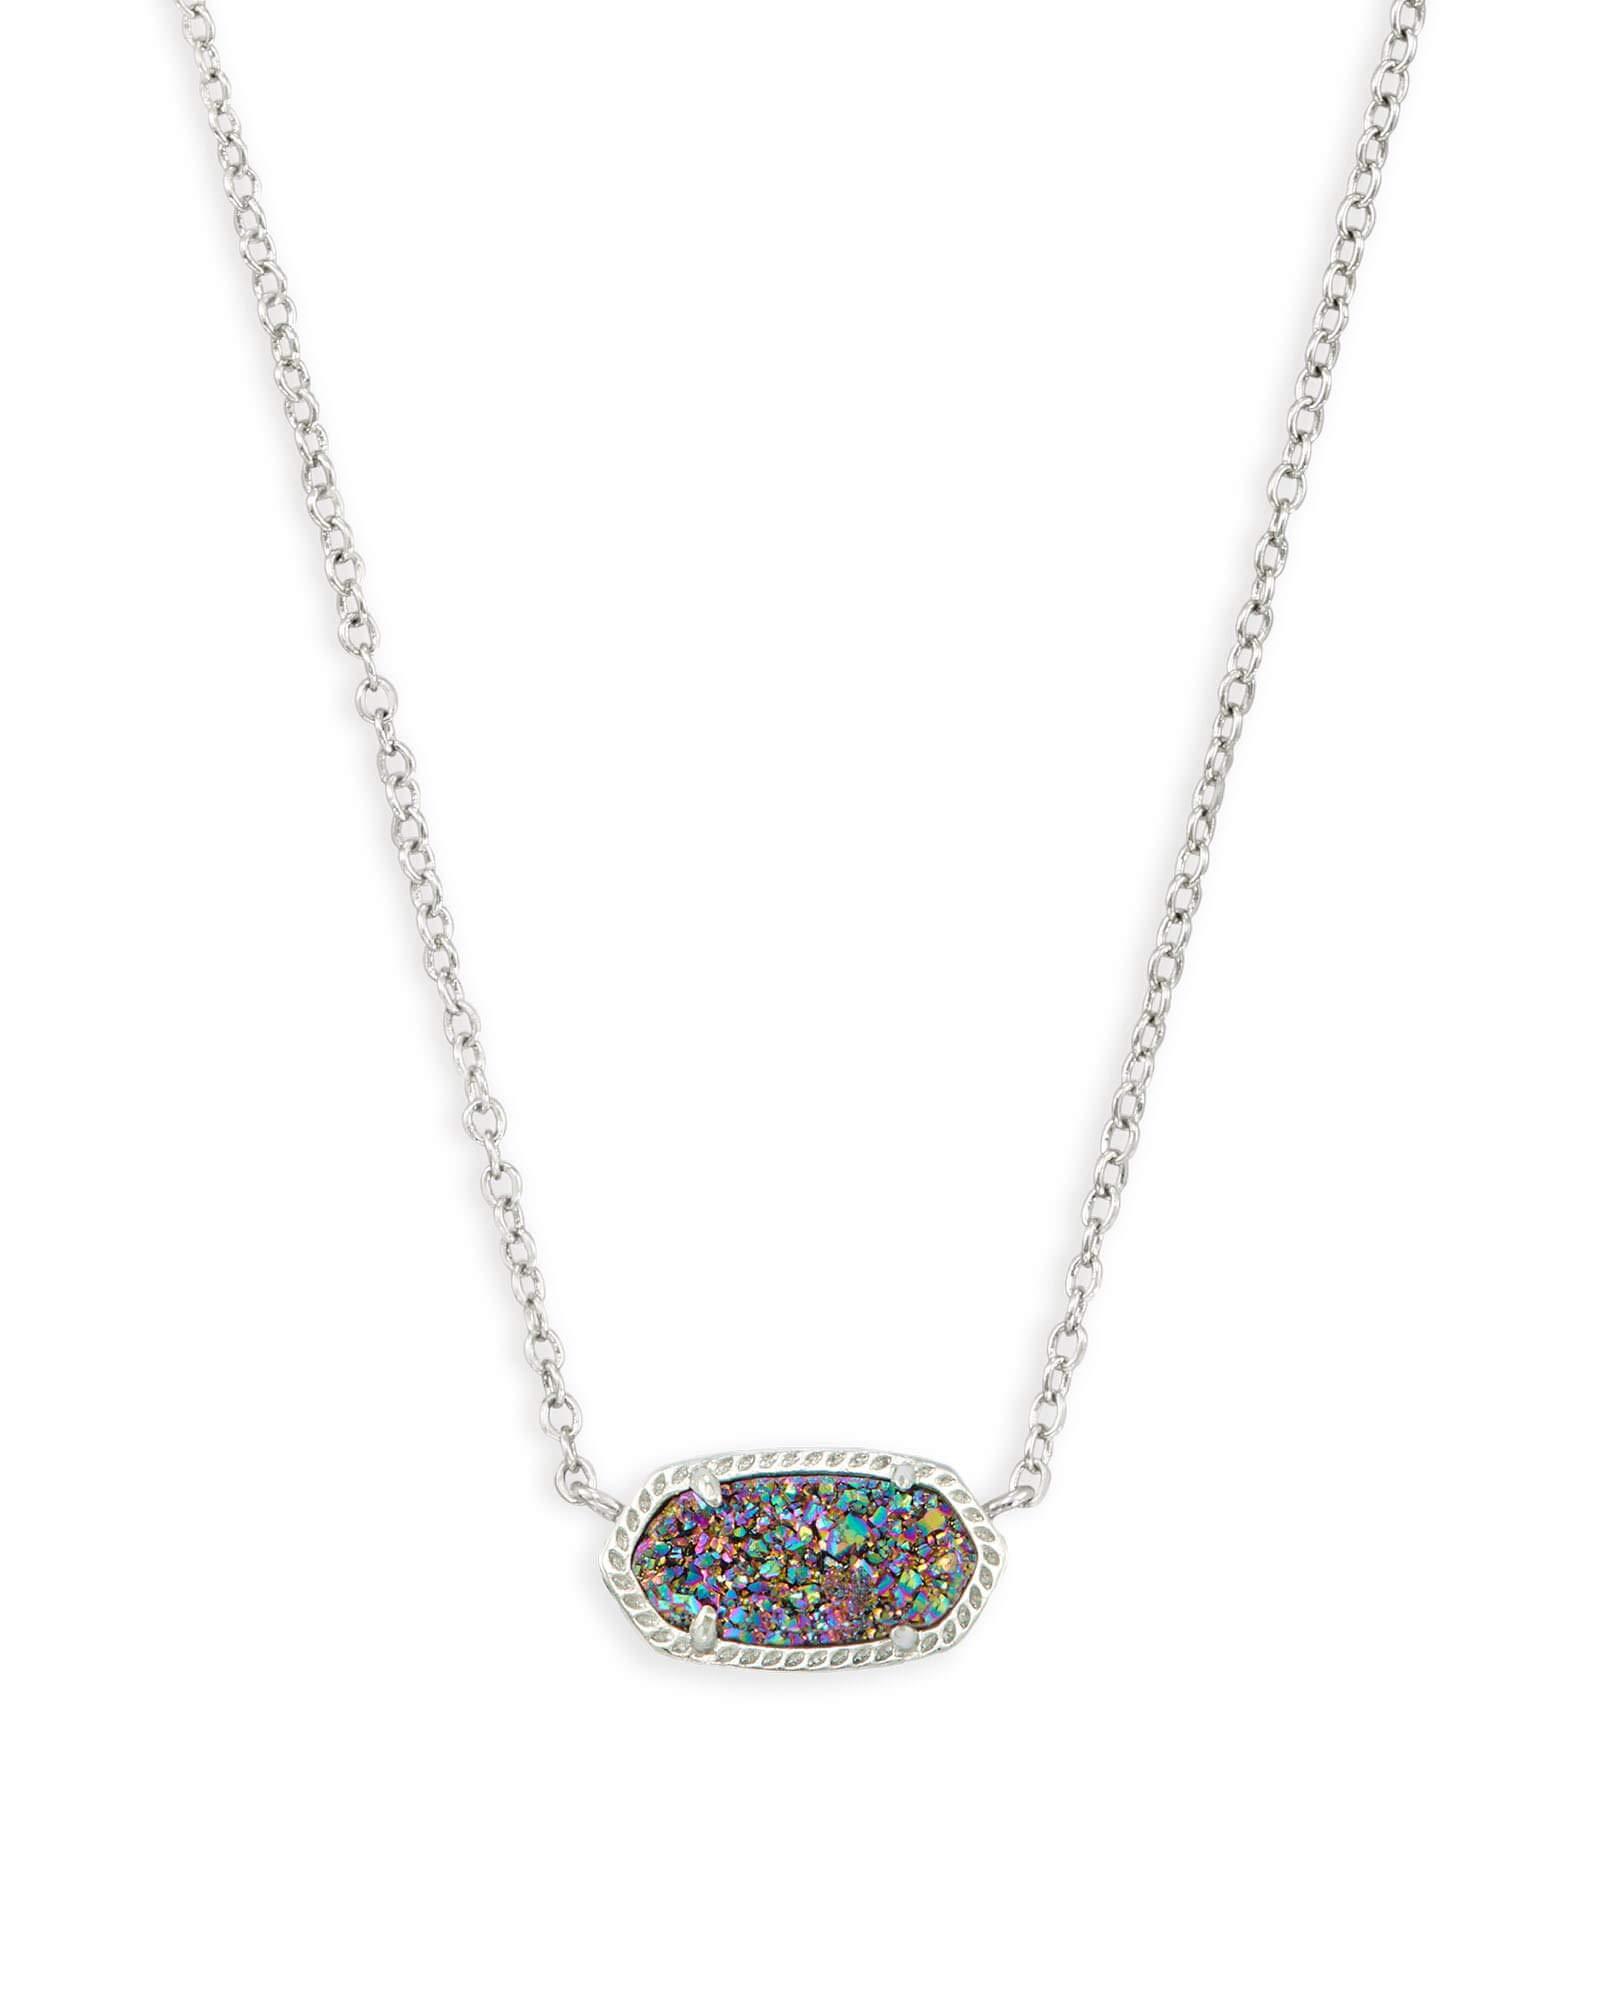 Kendra Scott Elisa Oval Pendant Necklace in Multi Drusy & Rhodium